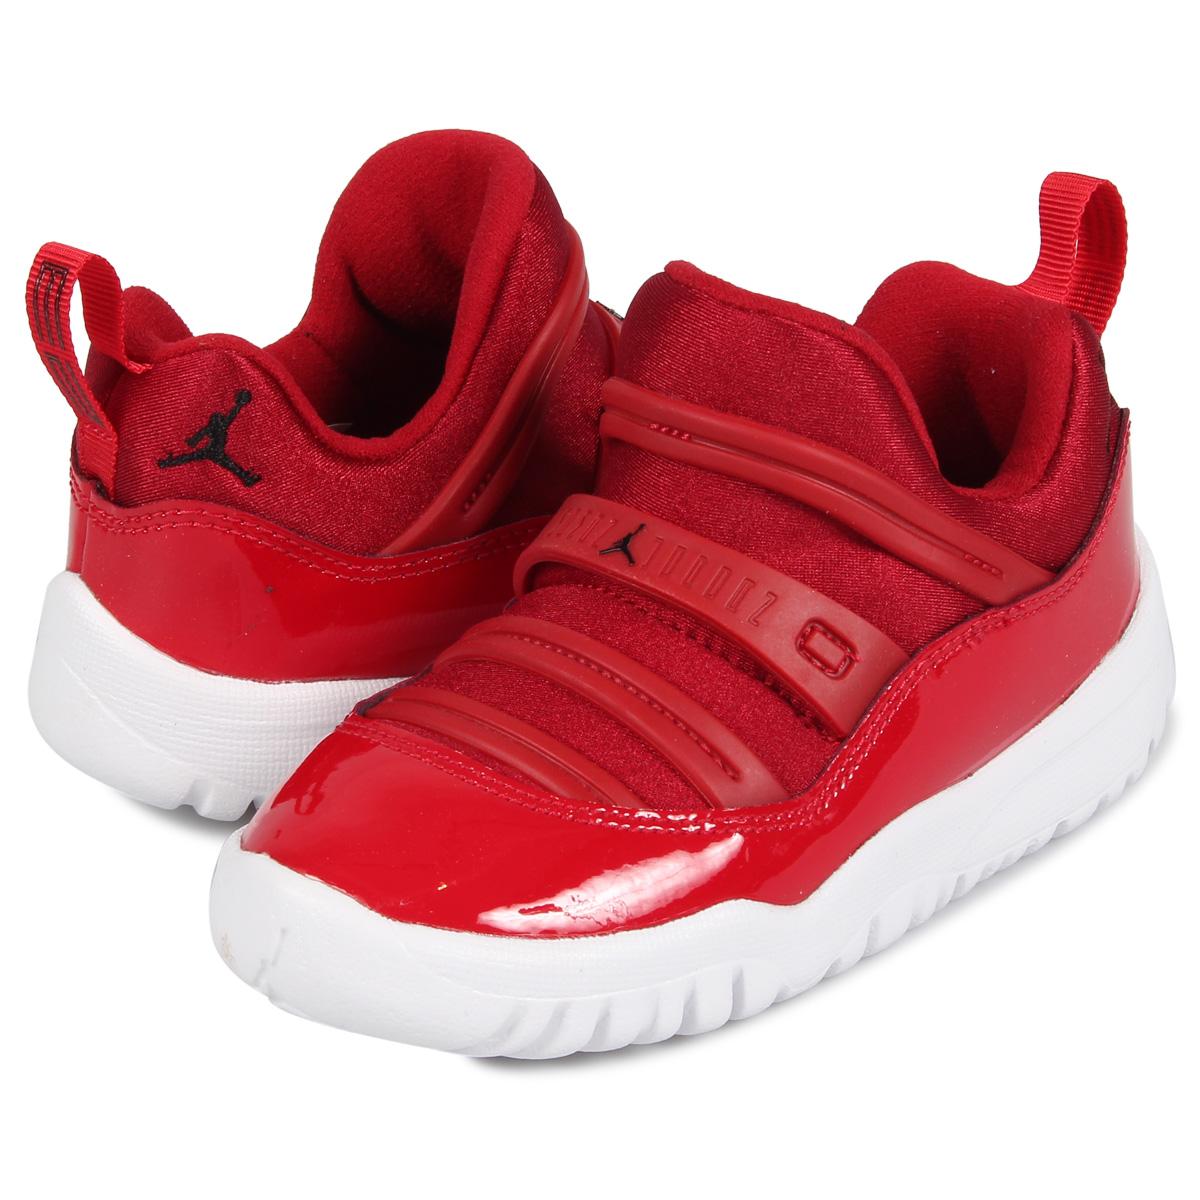 competitive price 6661c fbfcd Nike NIKE Air Jordan 11 nostalgic sneakers slip-ons kids AIR JORDAN 11  RETRO LITTLE FLEX PS red BQ7101-623 [197]